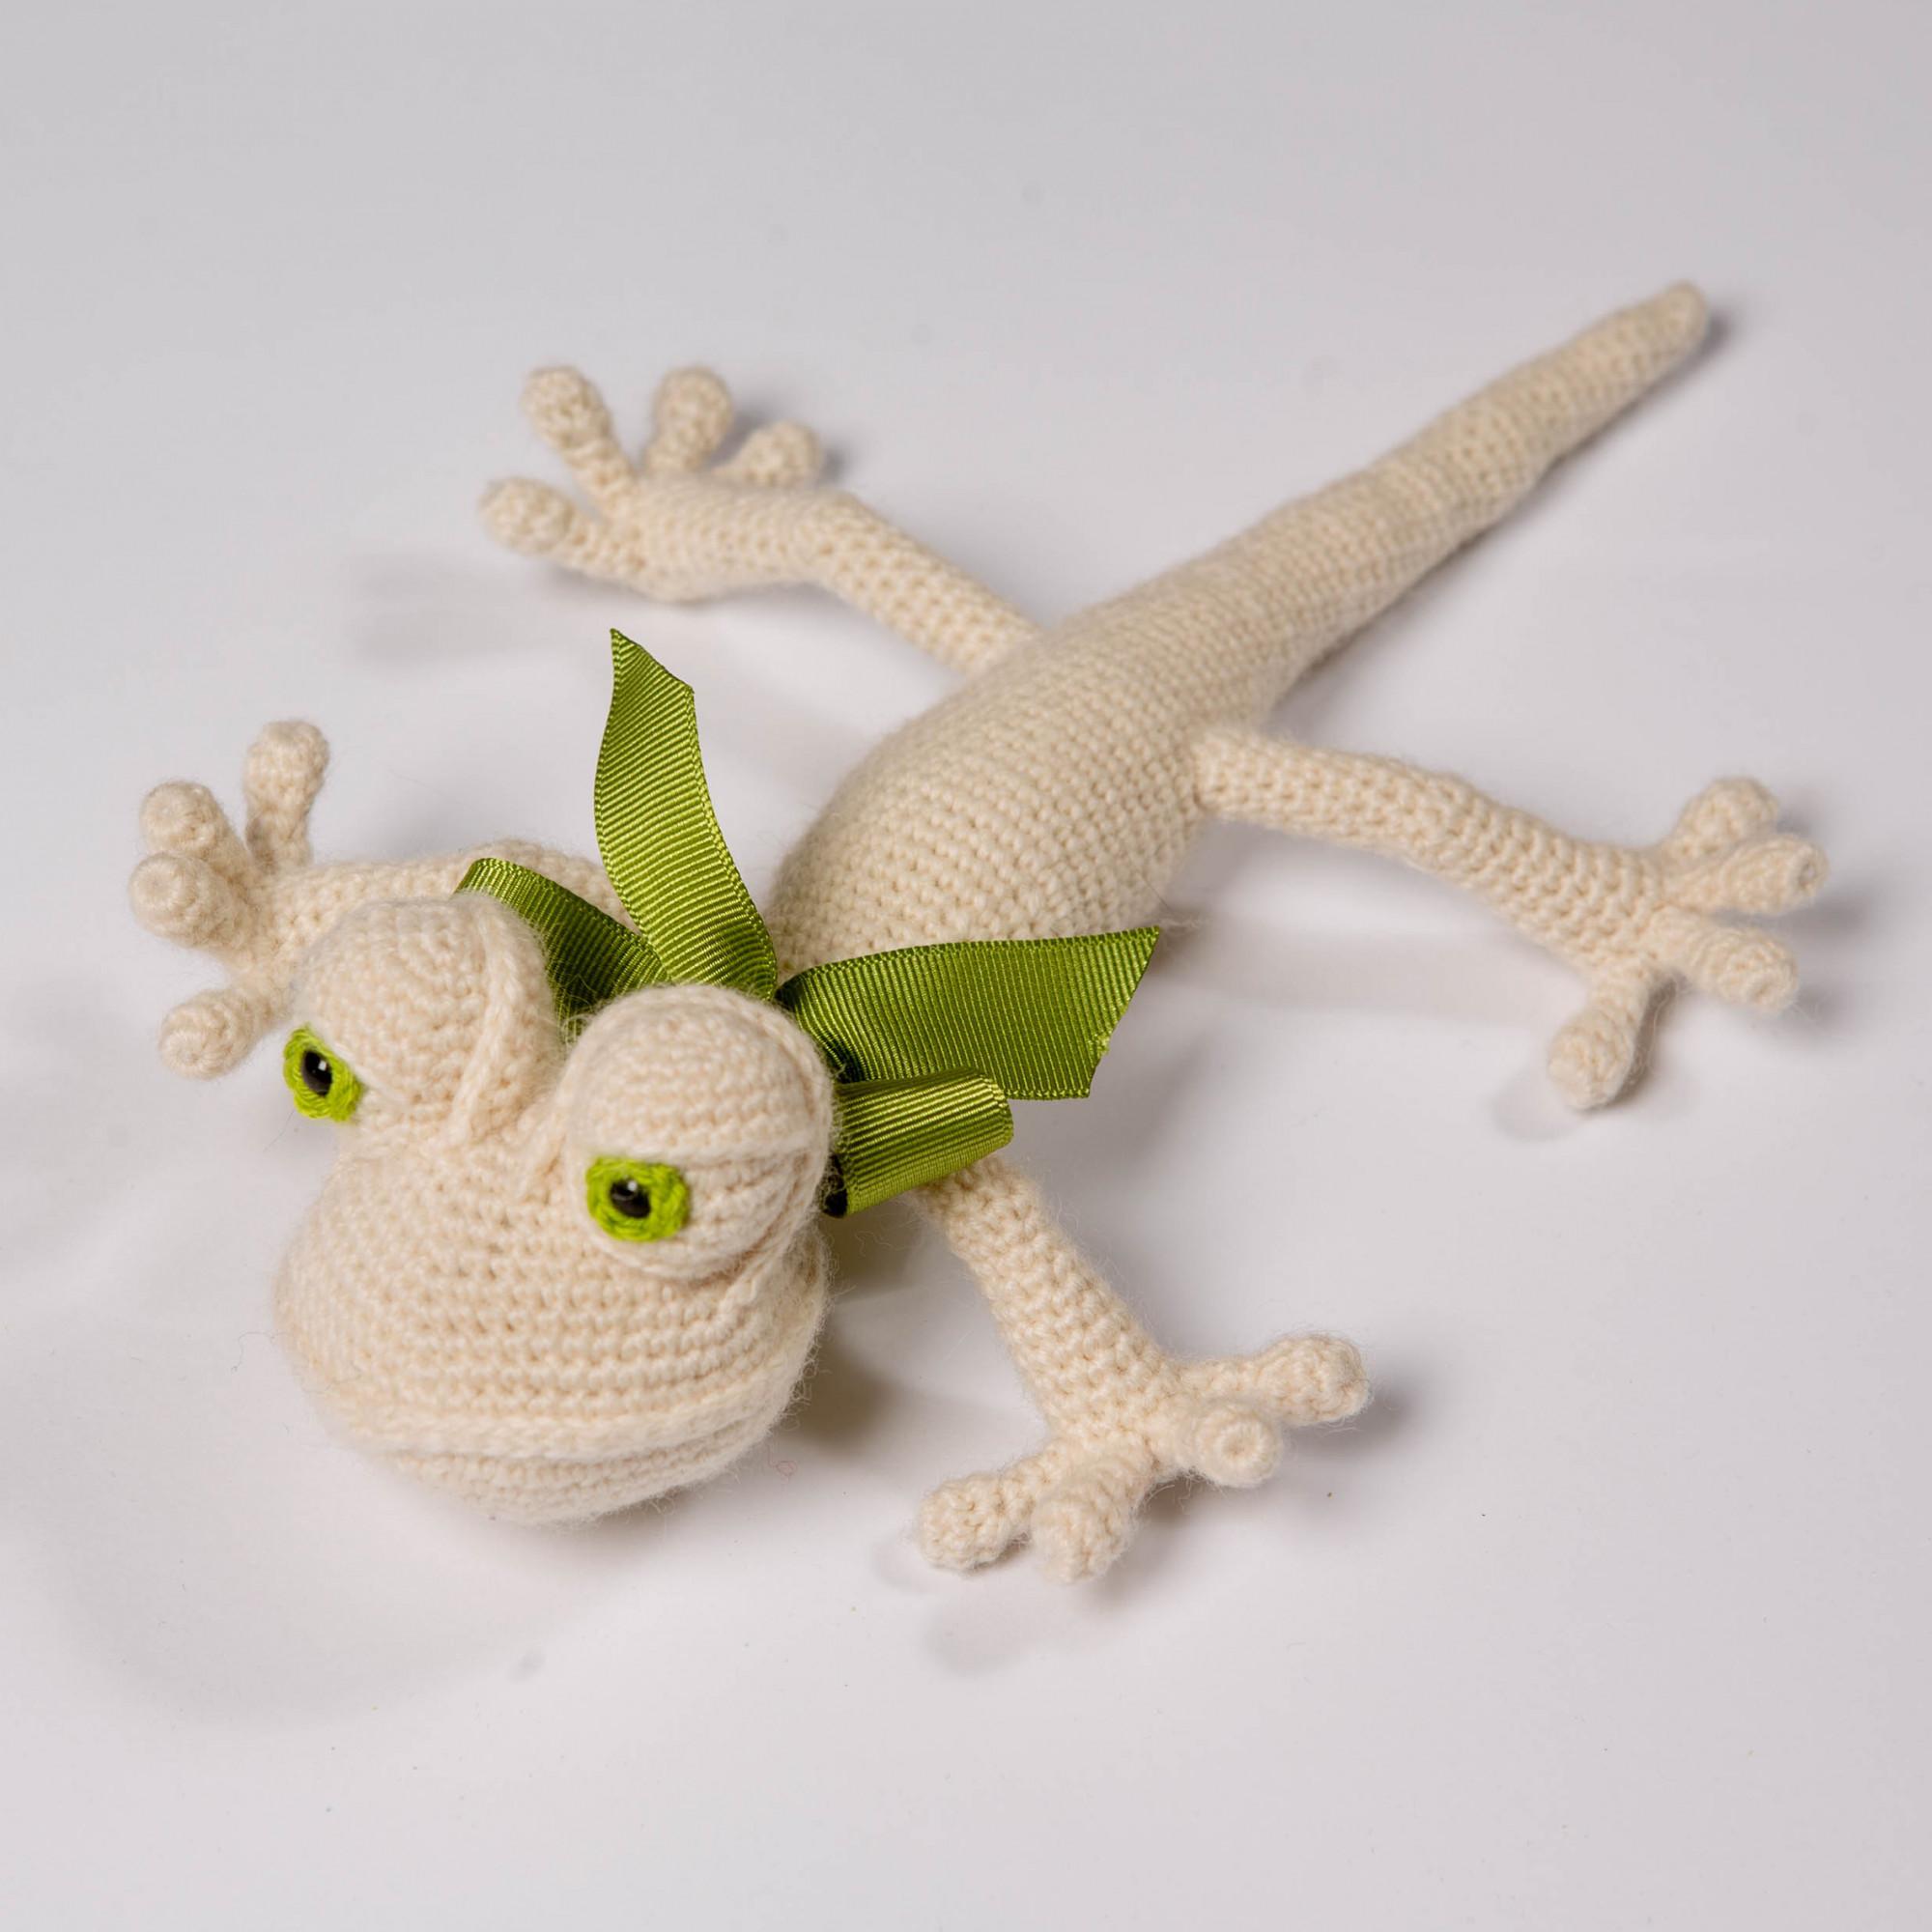 Gift crocheted Lizard White funny reptile